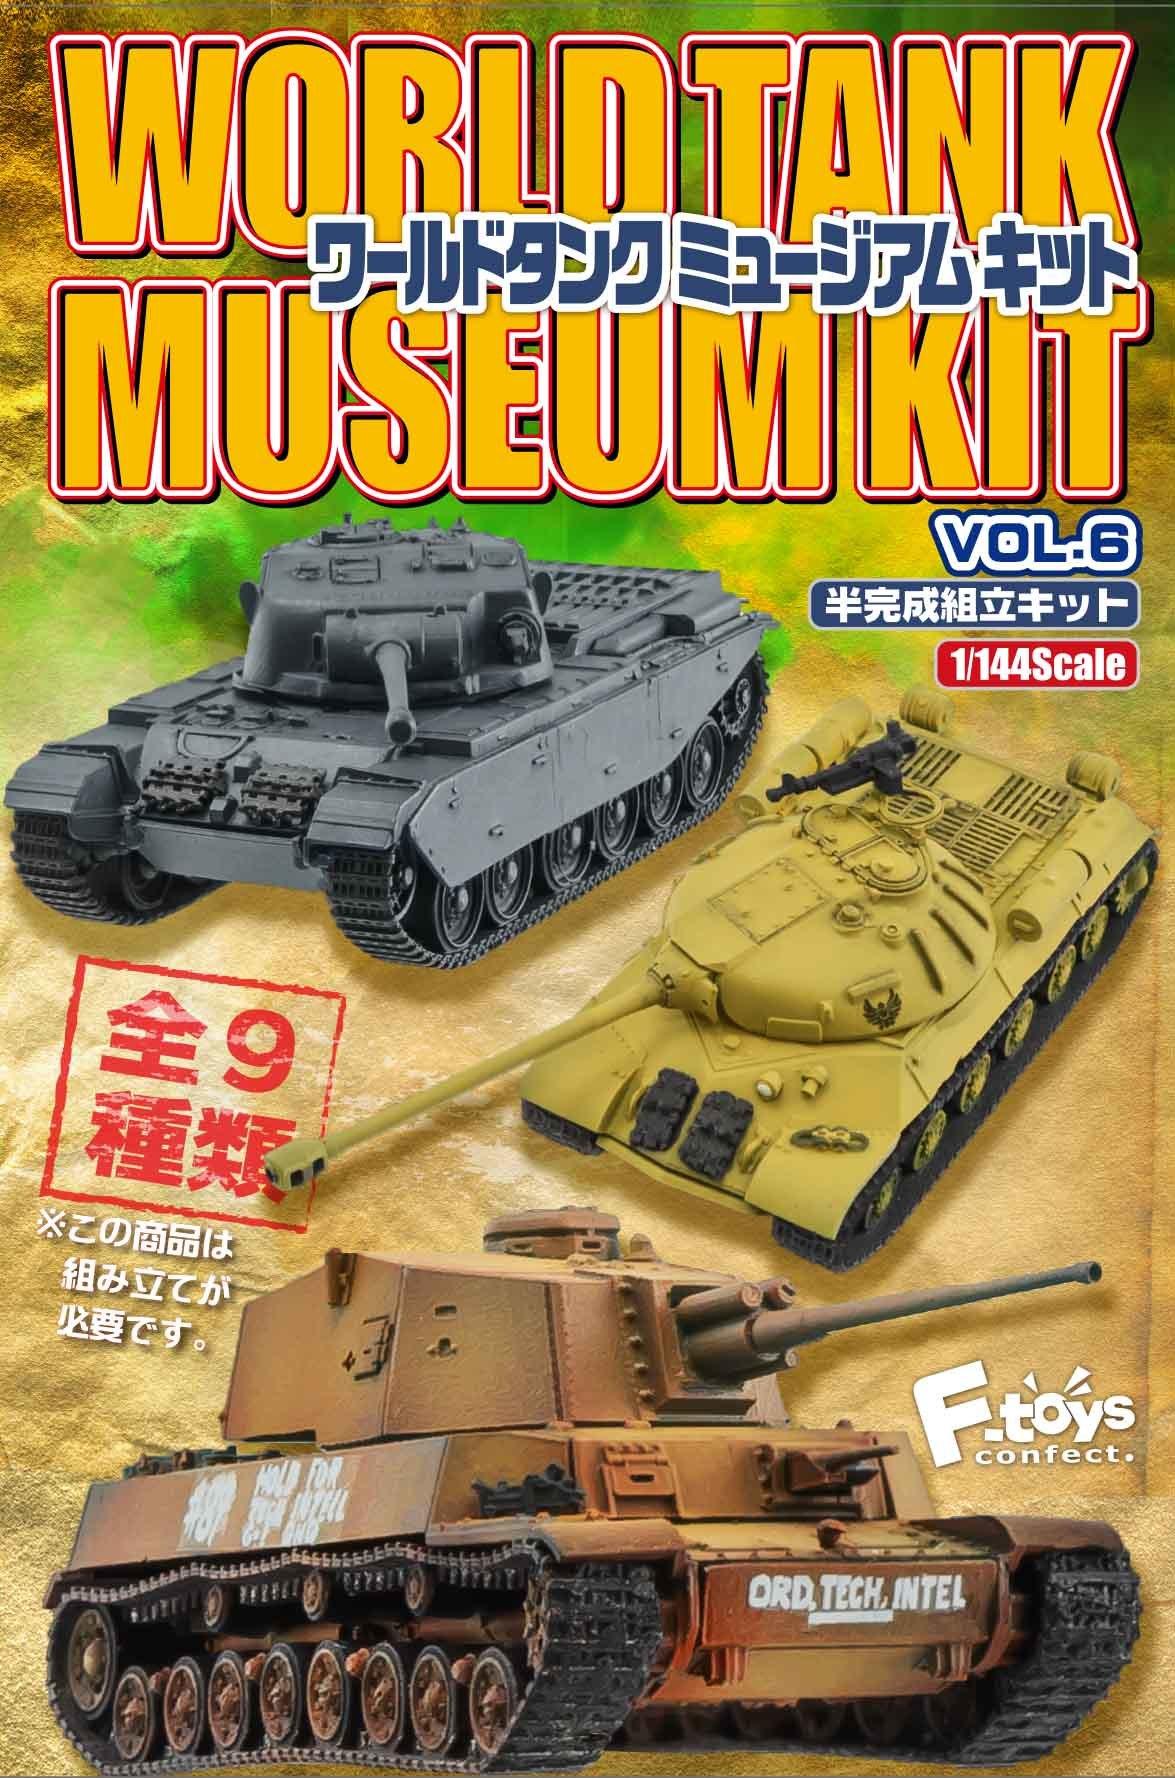 F-toys confect - WORLD TANK MUSEUM KIT 6.jpg